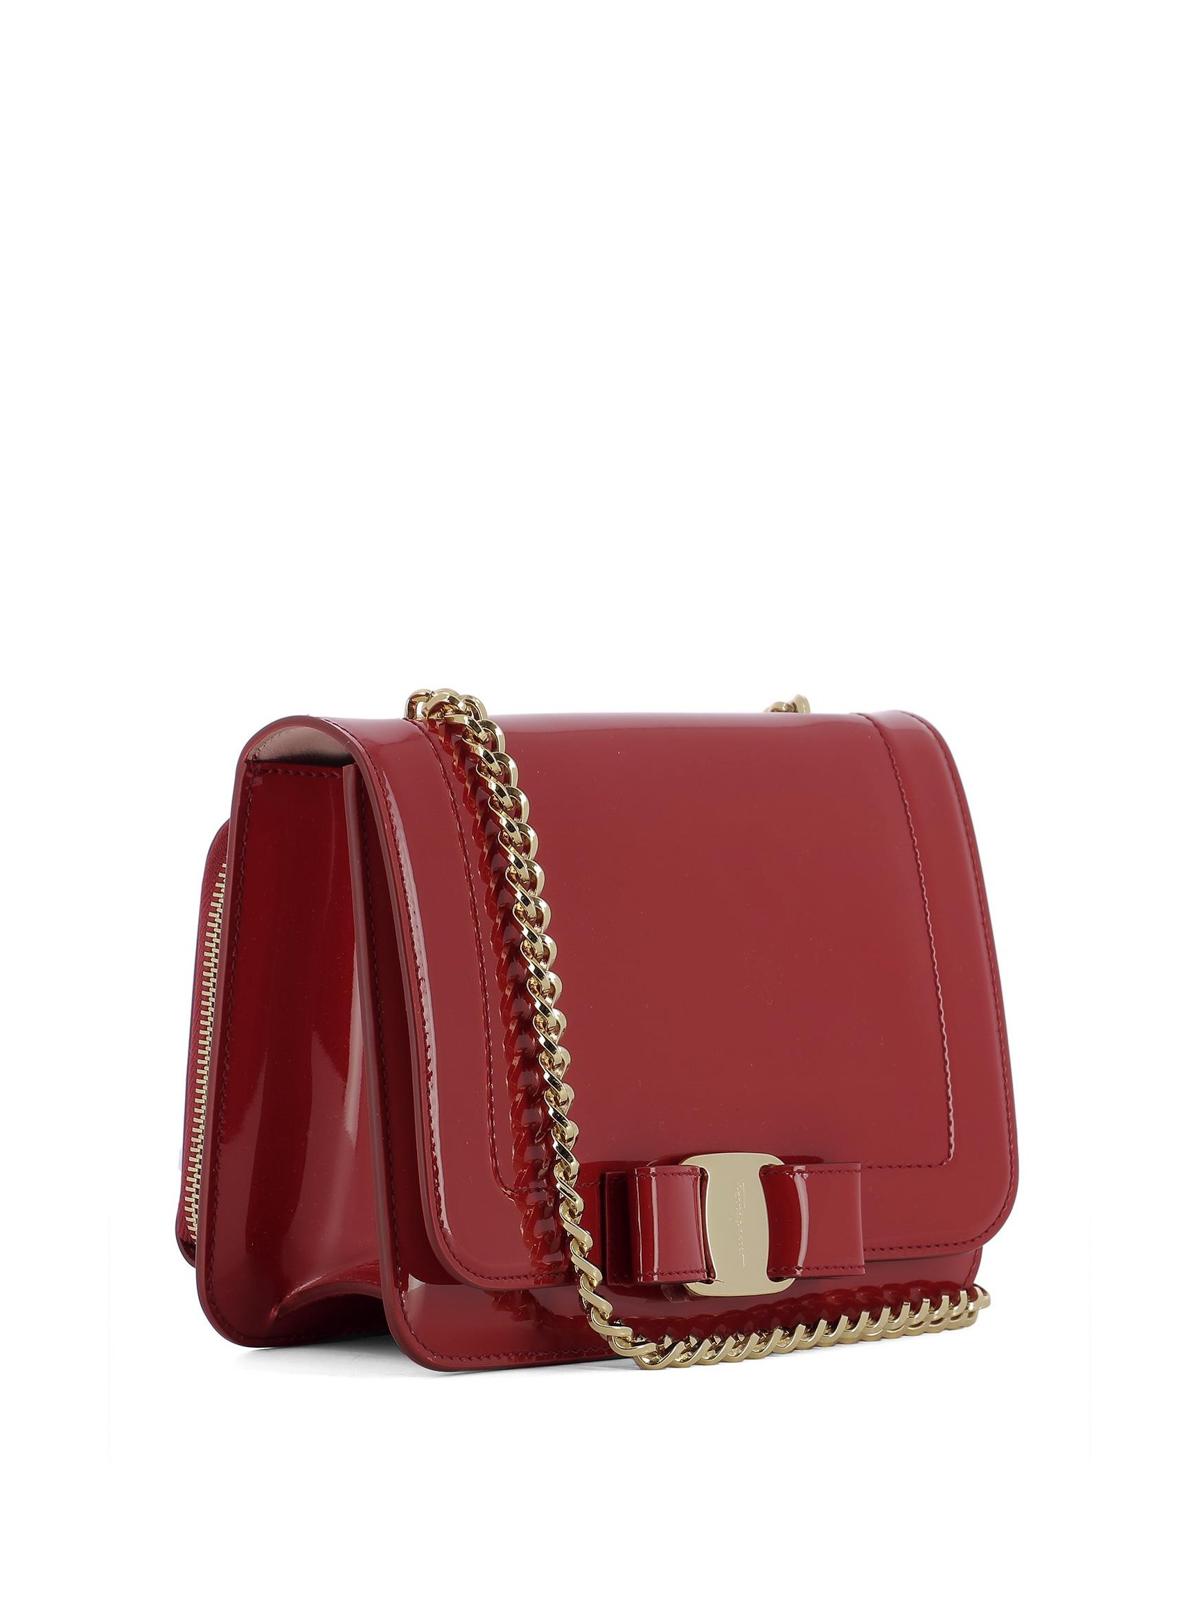 ea5d235f64ae SALVATORE FERRAGAMO  cross body bags online - Vara Rainbow red patent  leather bag